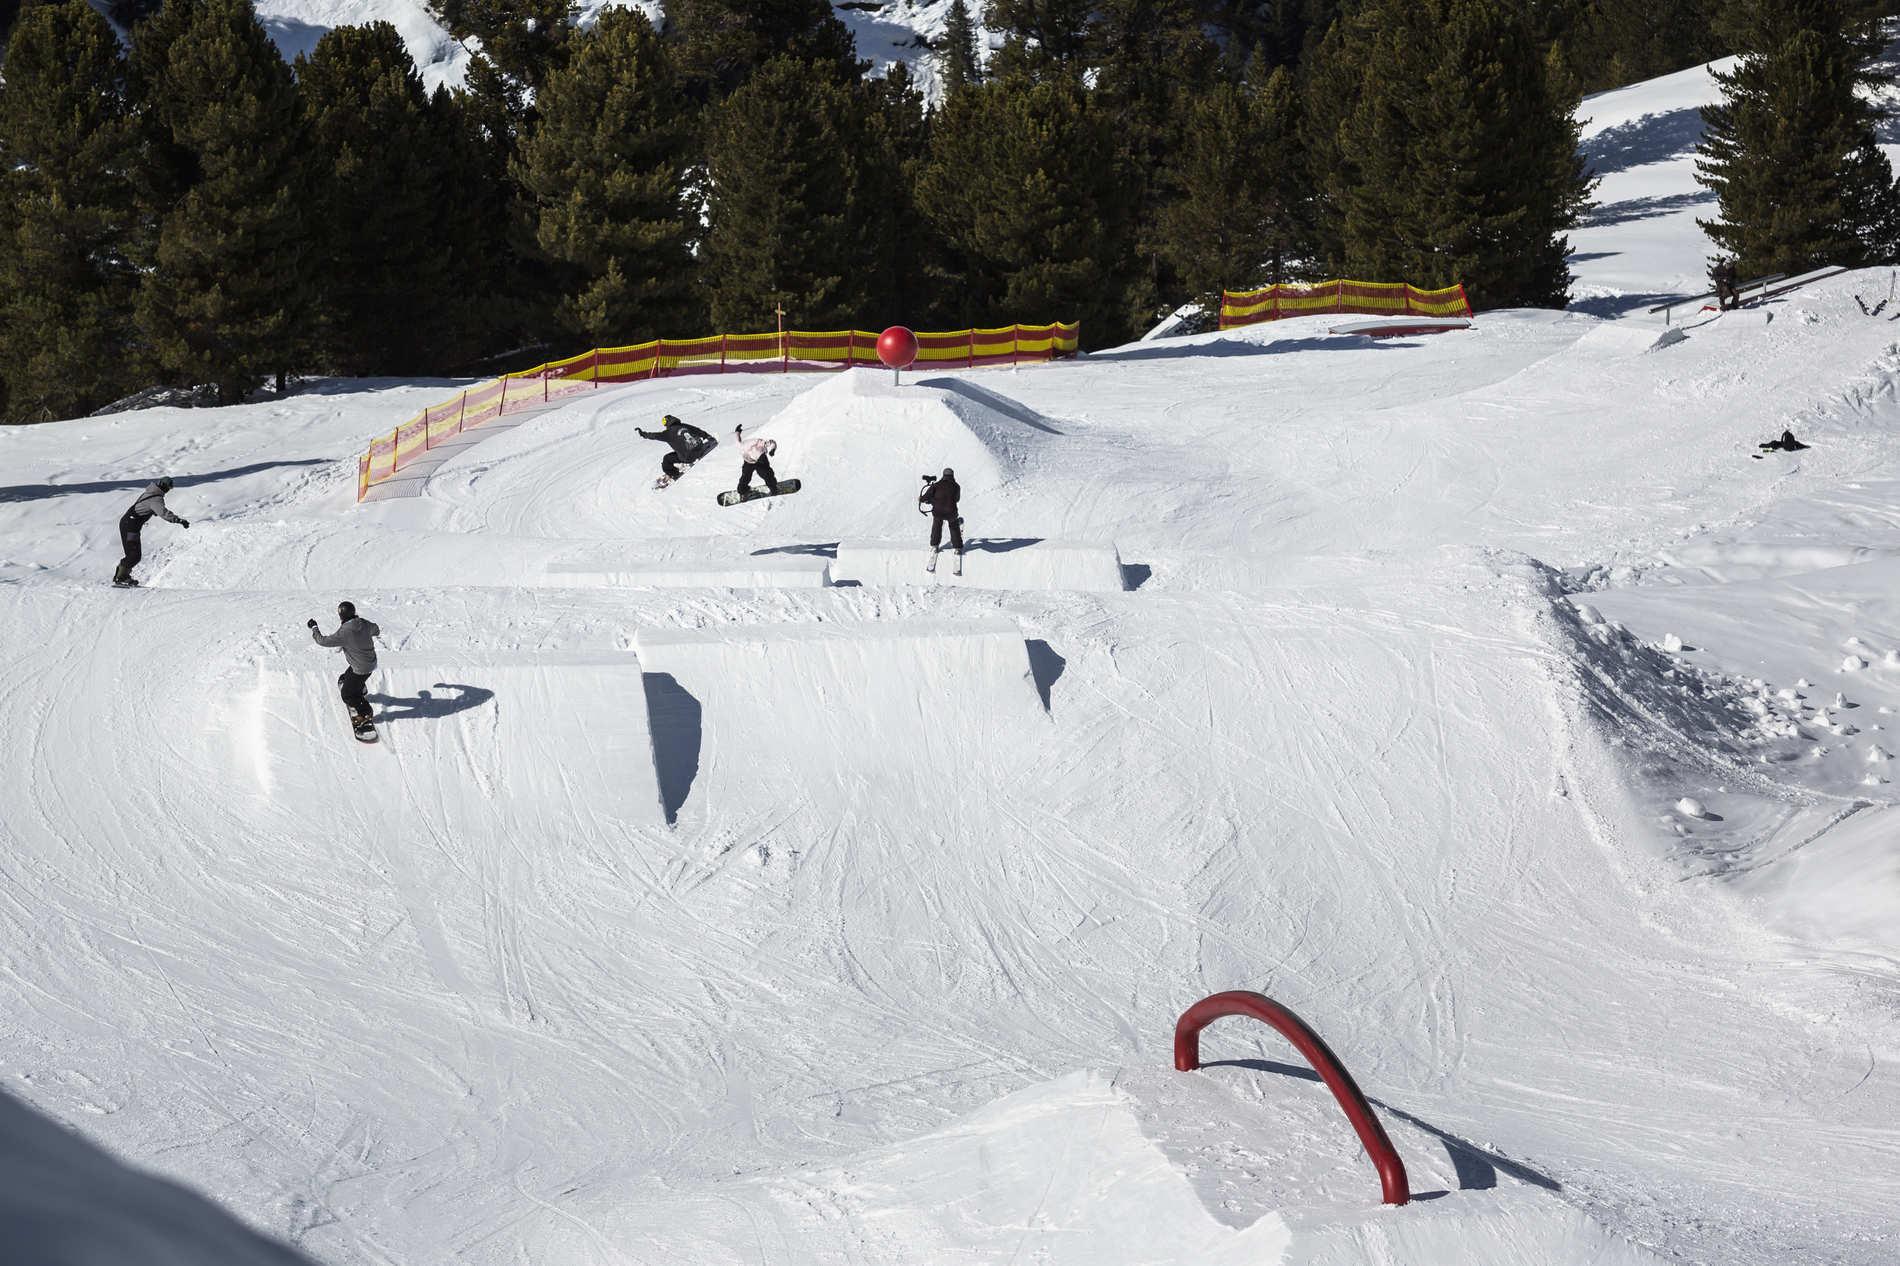 web obergurgl 14 03 2018 action sb snowboard crew roland haschka qparks 086